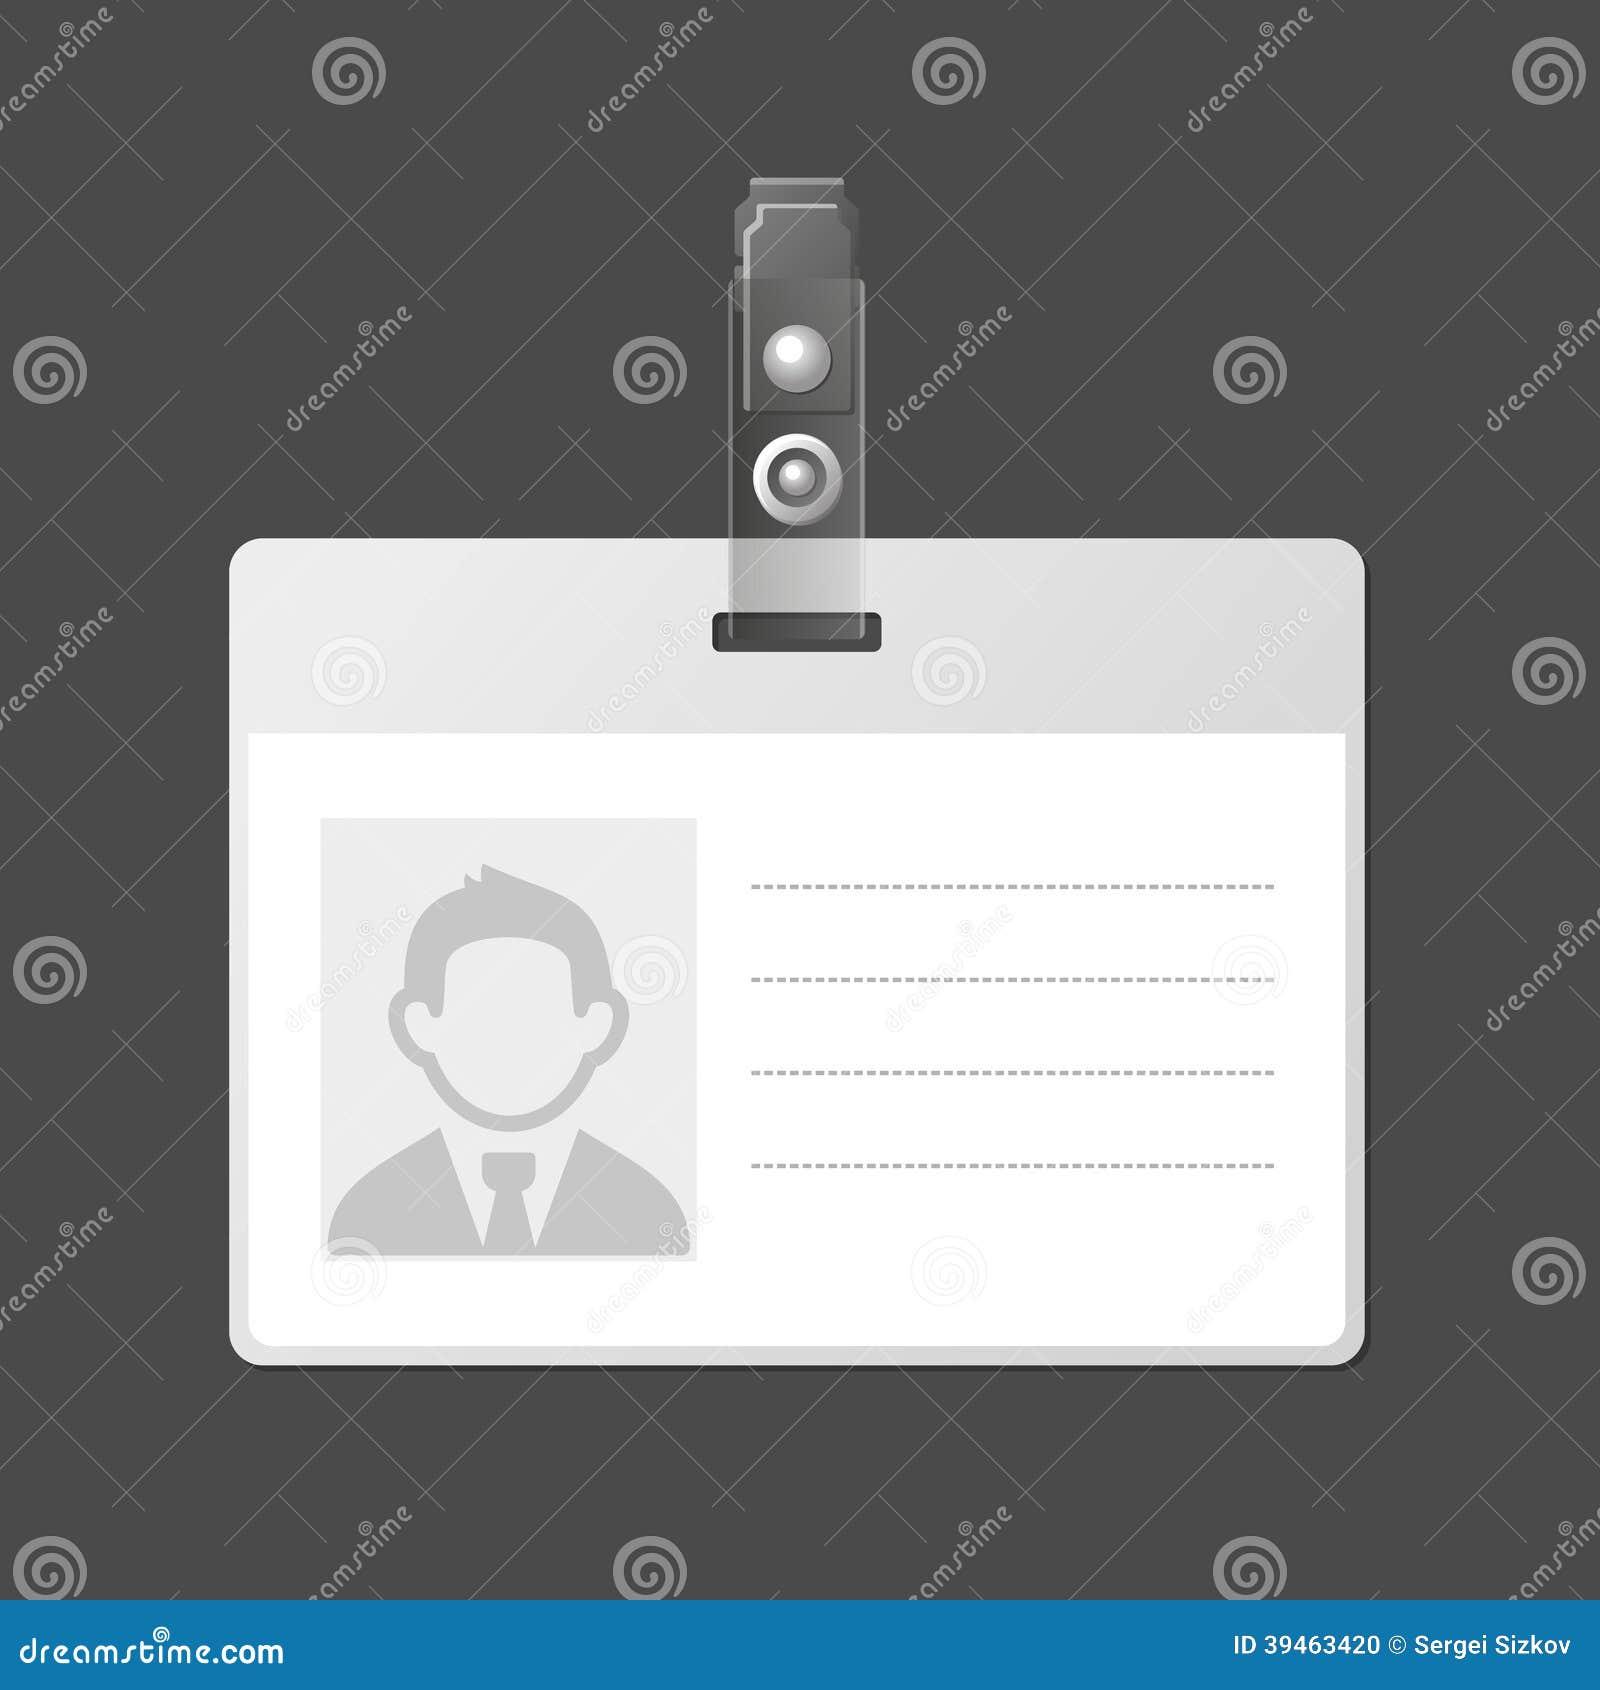 homeschool id card template - blank identification card badge id template vector stock